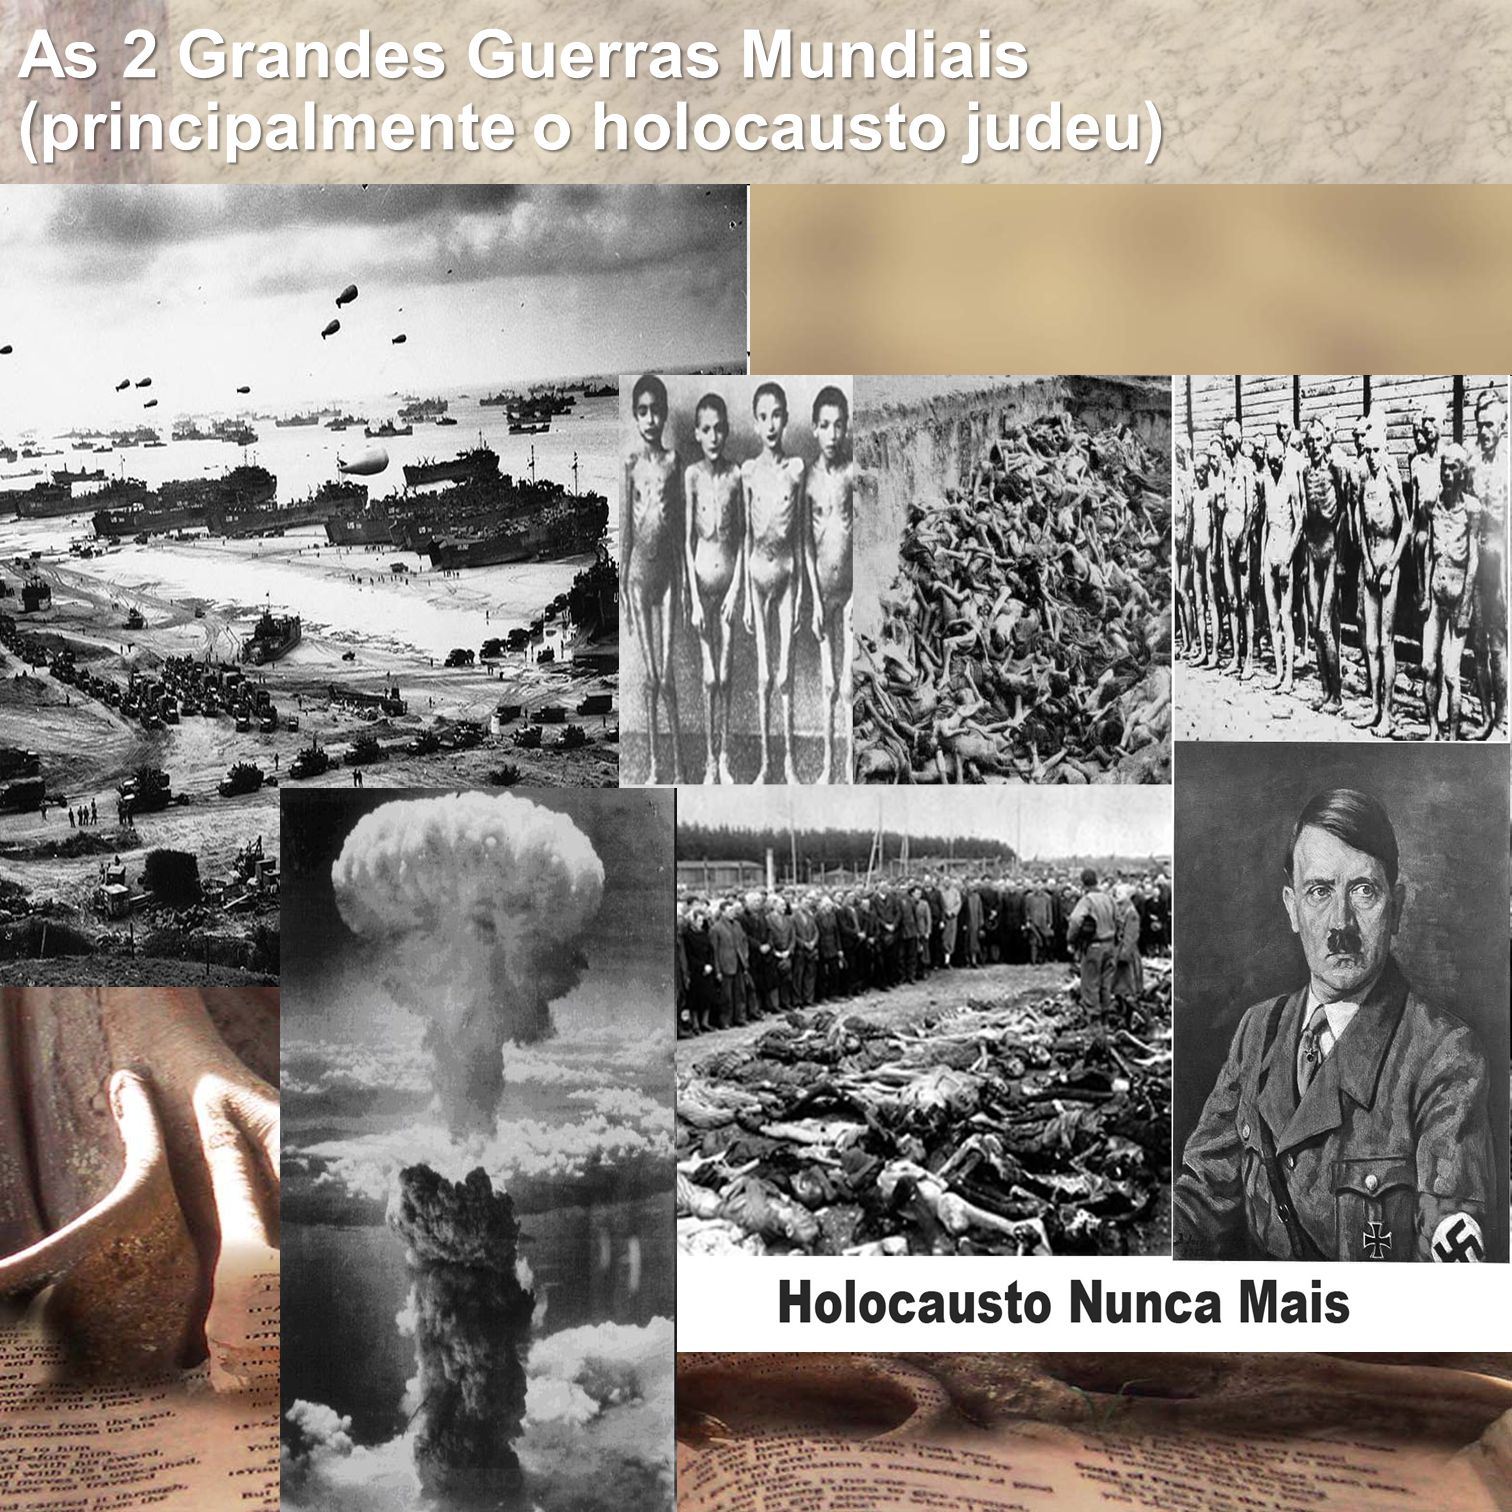 As 2 Grandes Guerras Mundiais (principalmente o holocausto judeu)